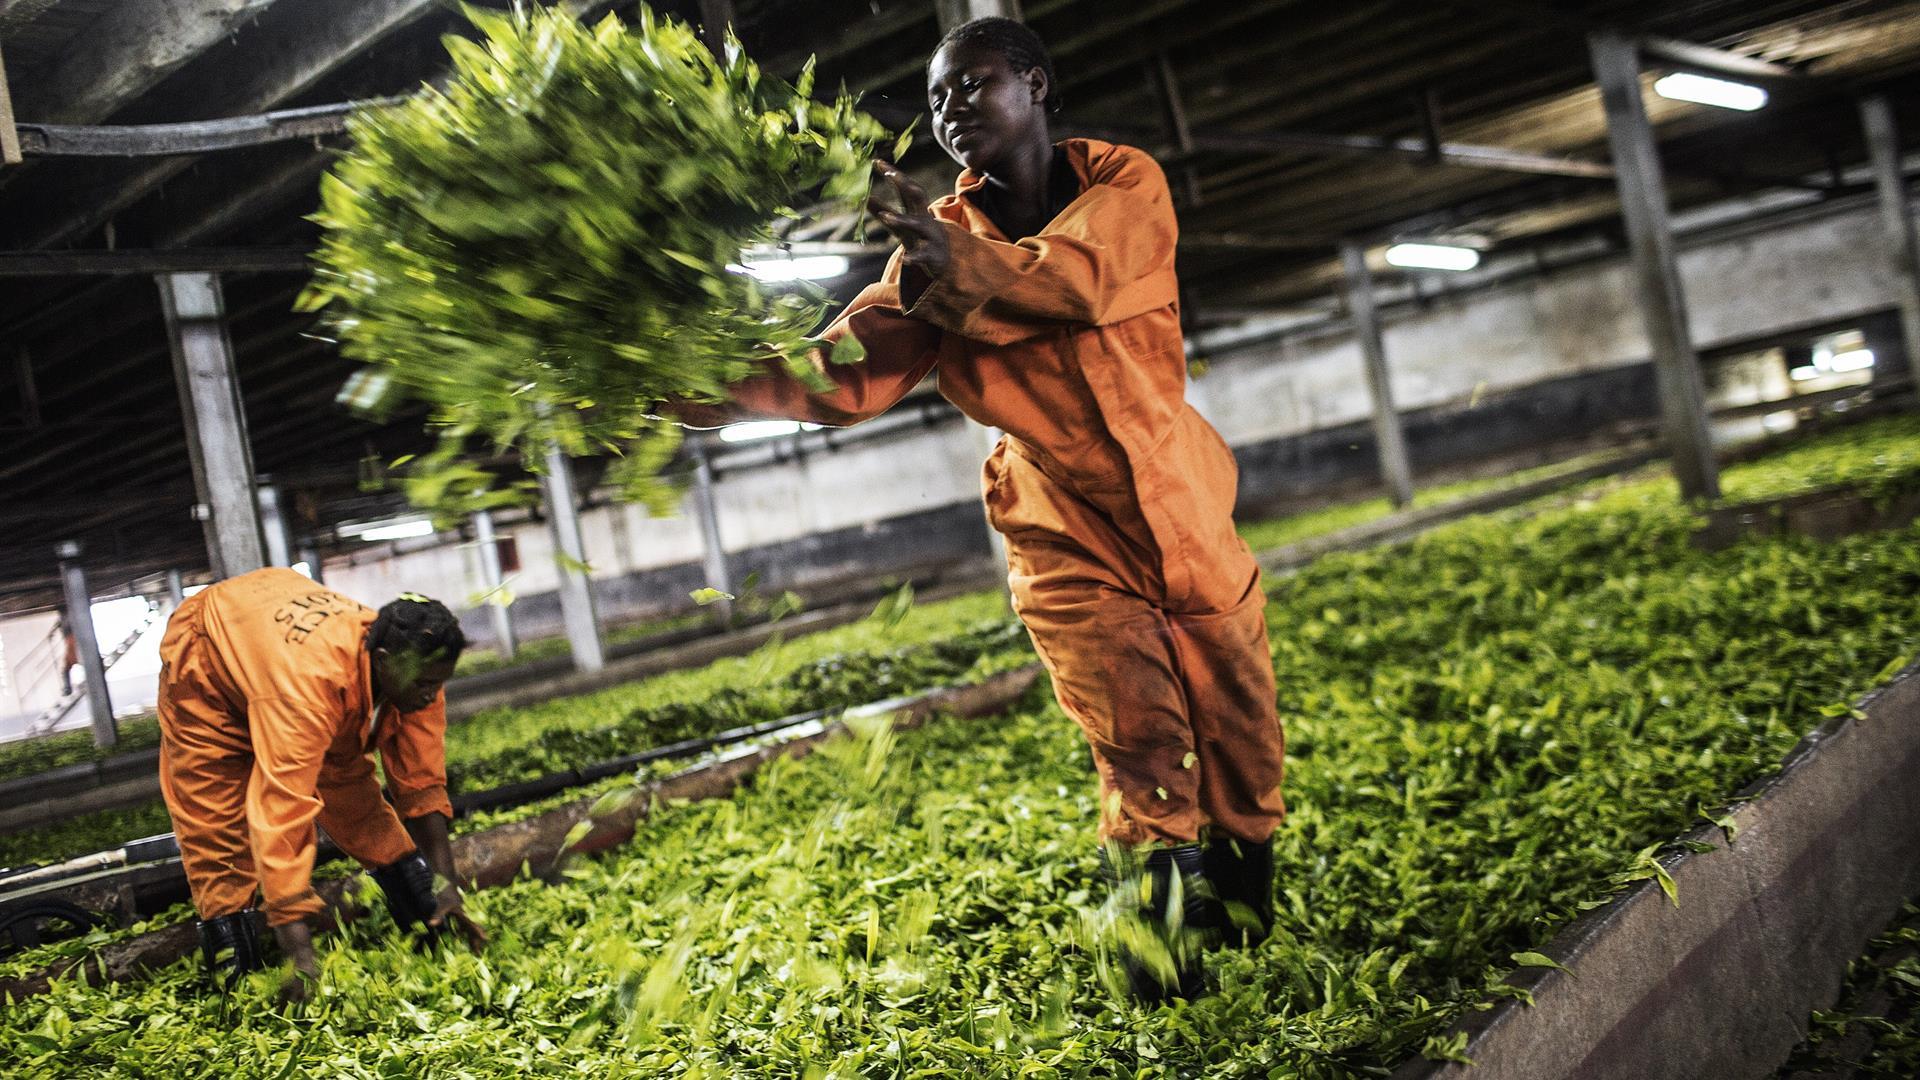 Africa Malawi Agricoltura Tè Getty Gianluigi Guercia